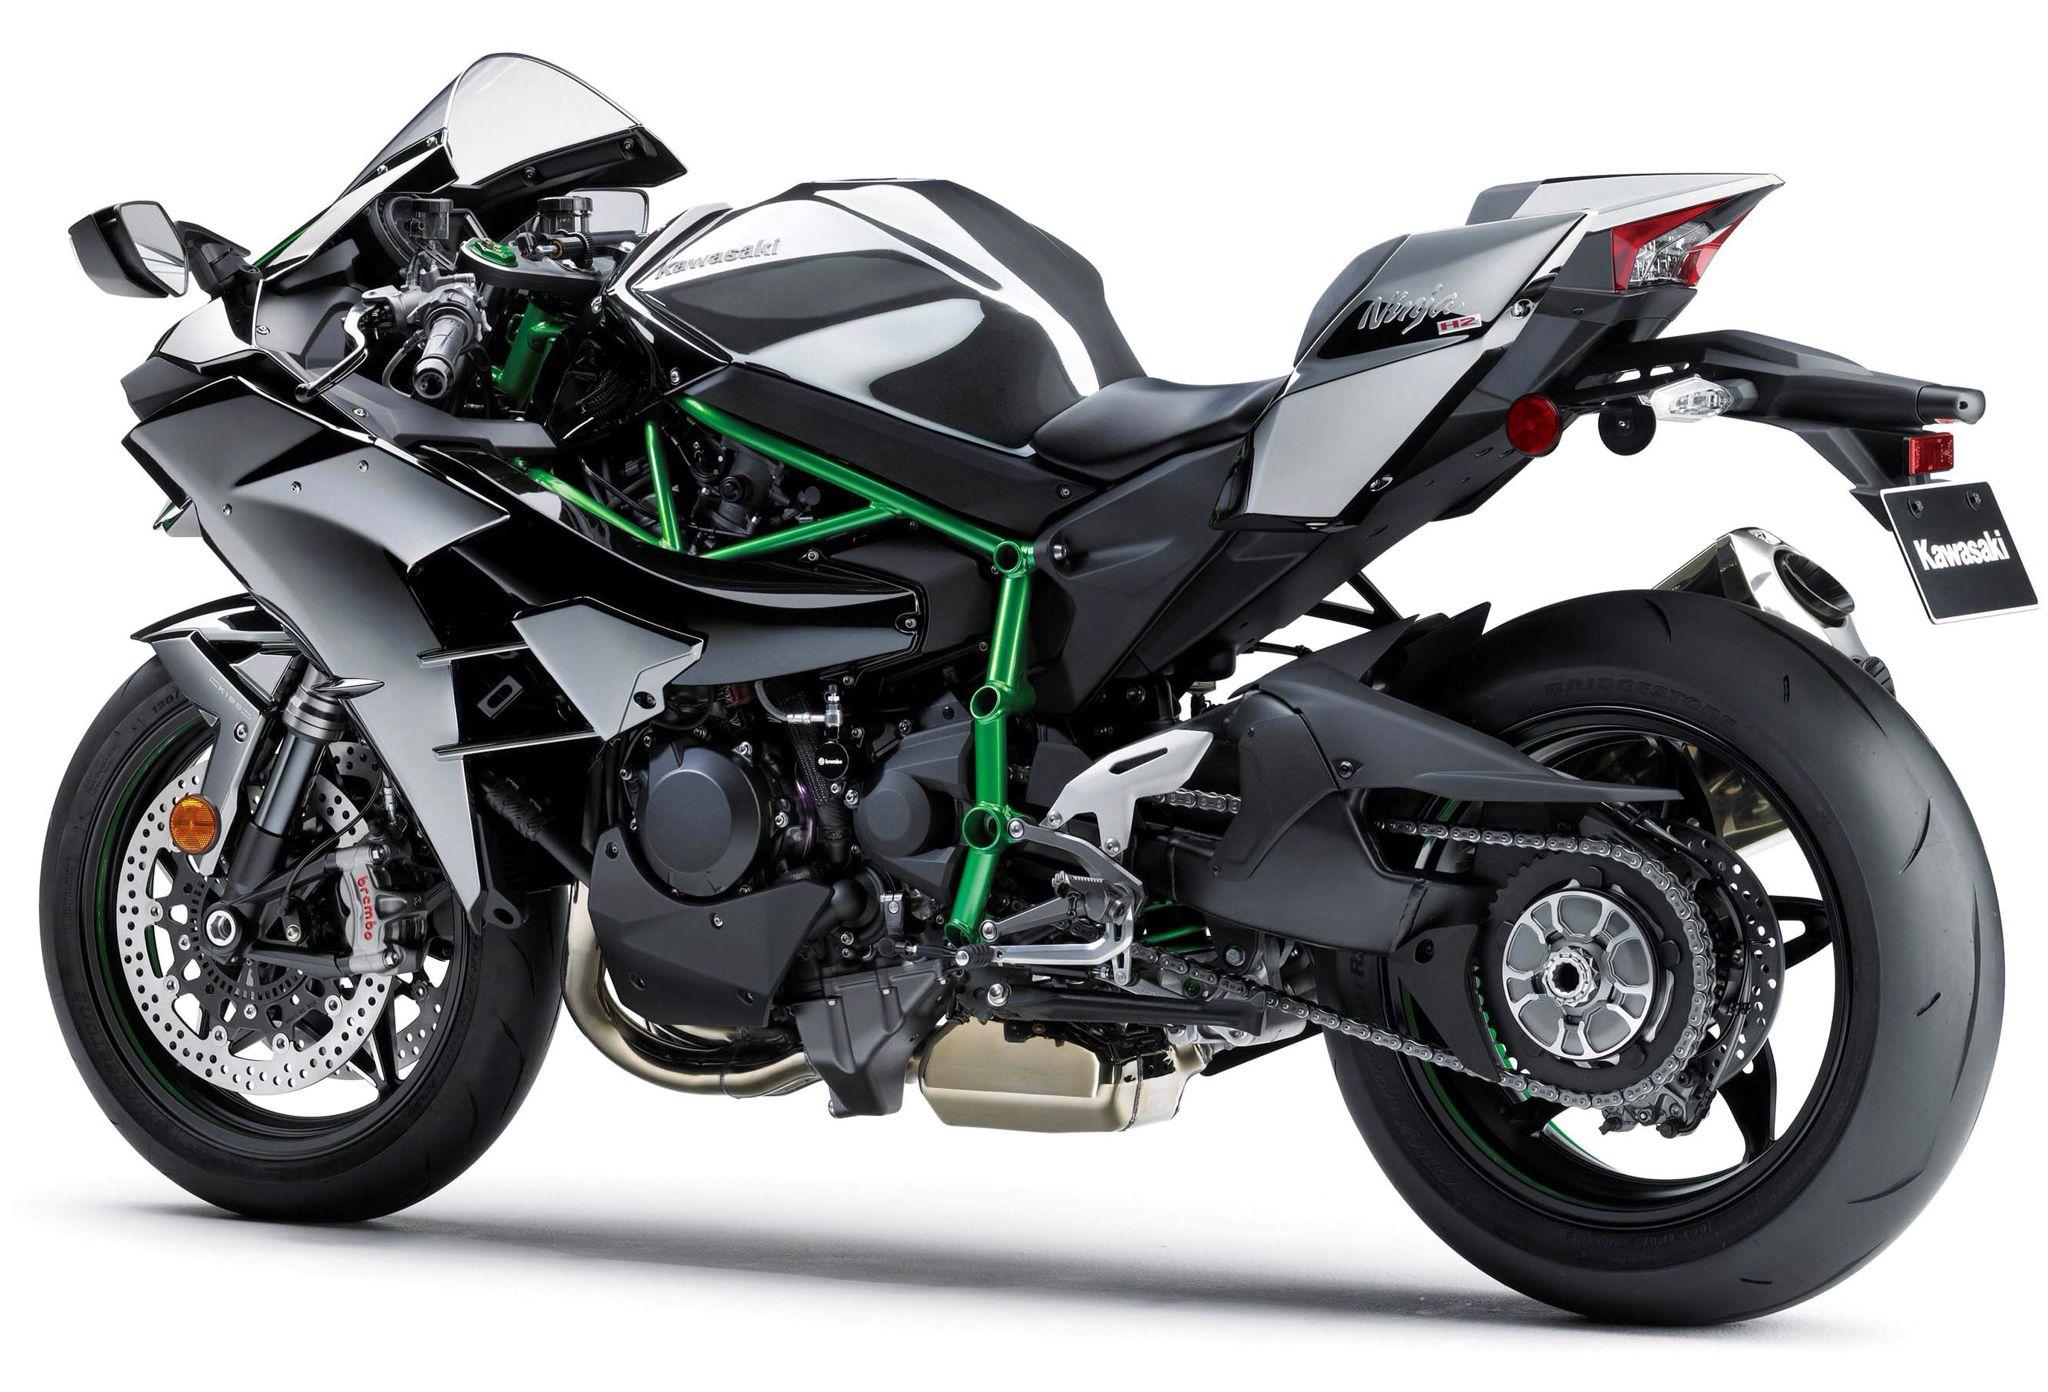 Kawasaki Ninja H2 supercharged street bike   Motorcycles, bikes